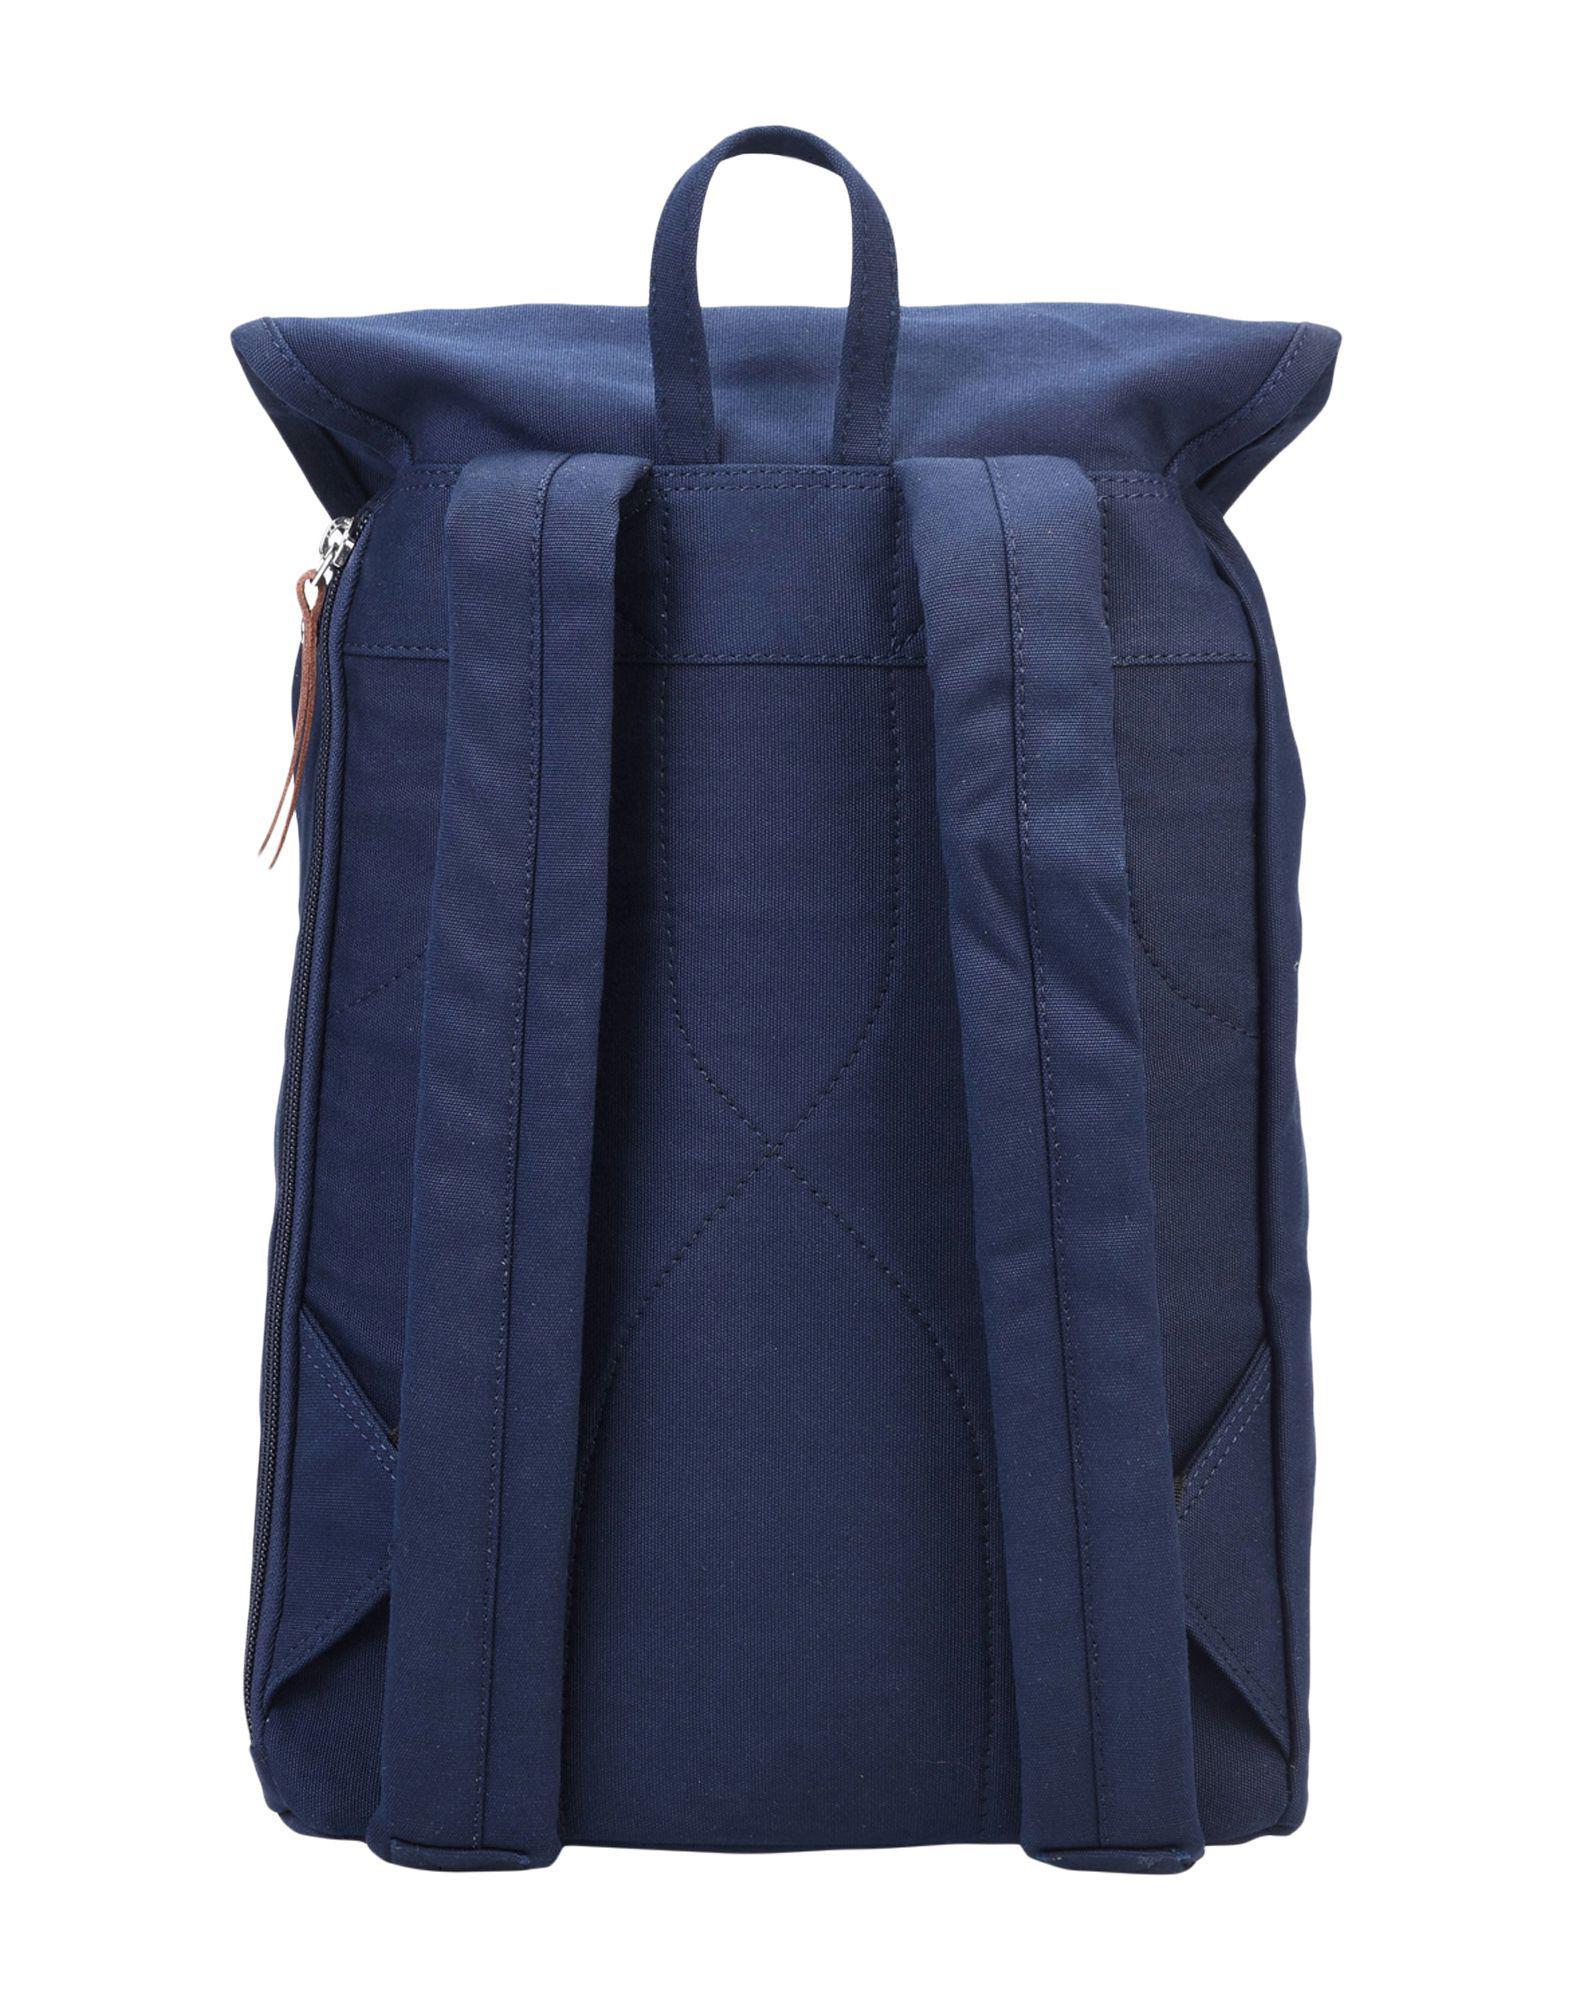 Sandqvist Canvas Backpacks & Fanny Packs in Dark Blue (Blue)